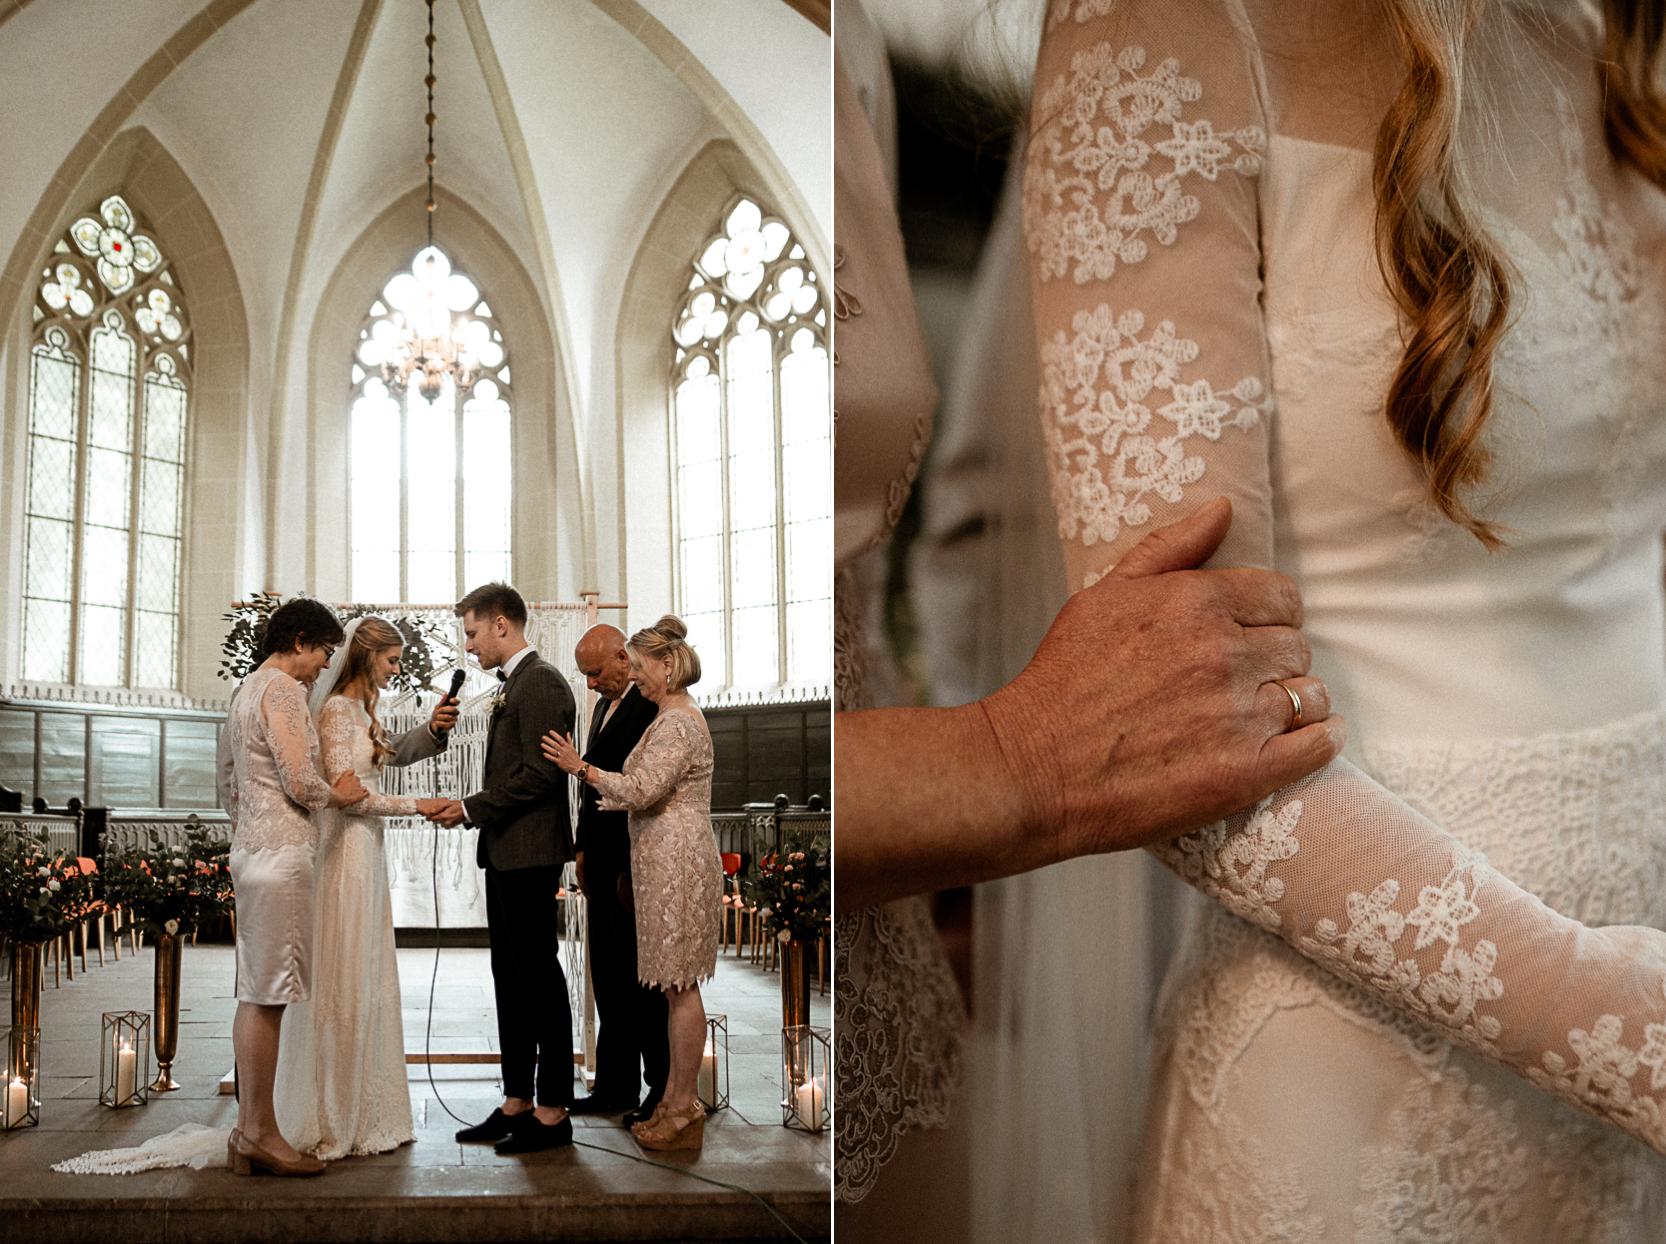 wholeheartedweddings-Timo-Matthies-Sean&Judy-boho-Barnweddings-1-2_hoch_6.jpg